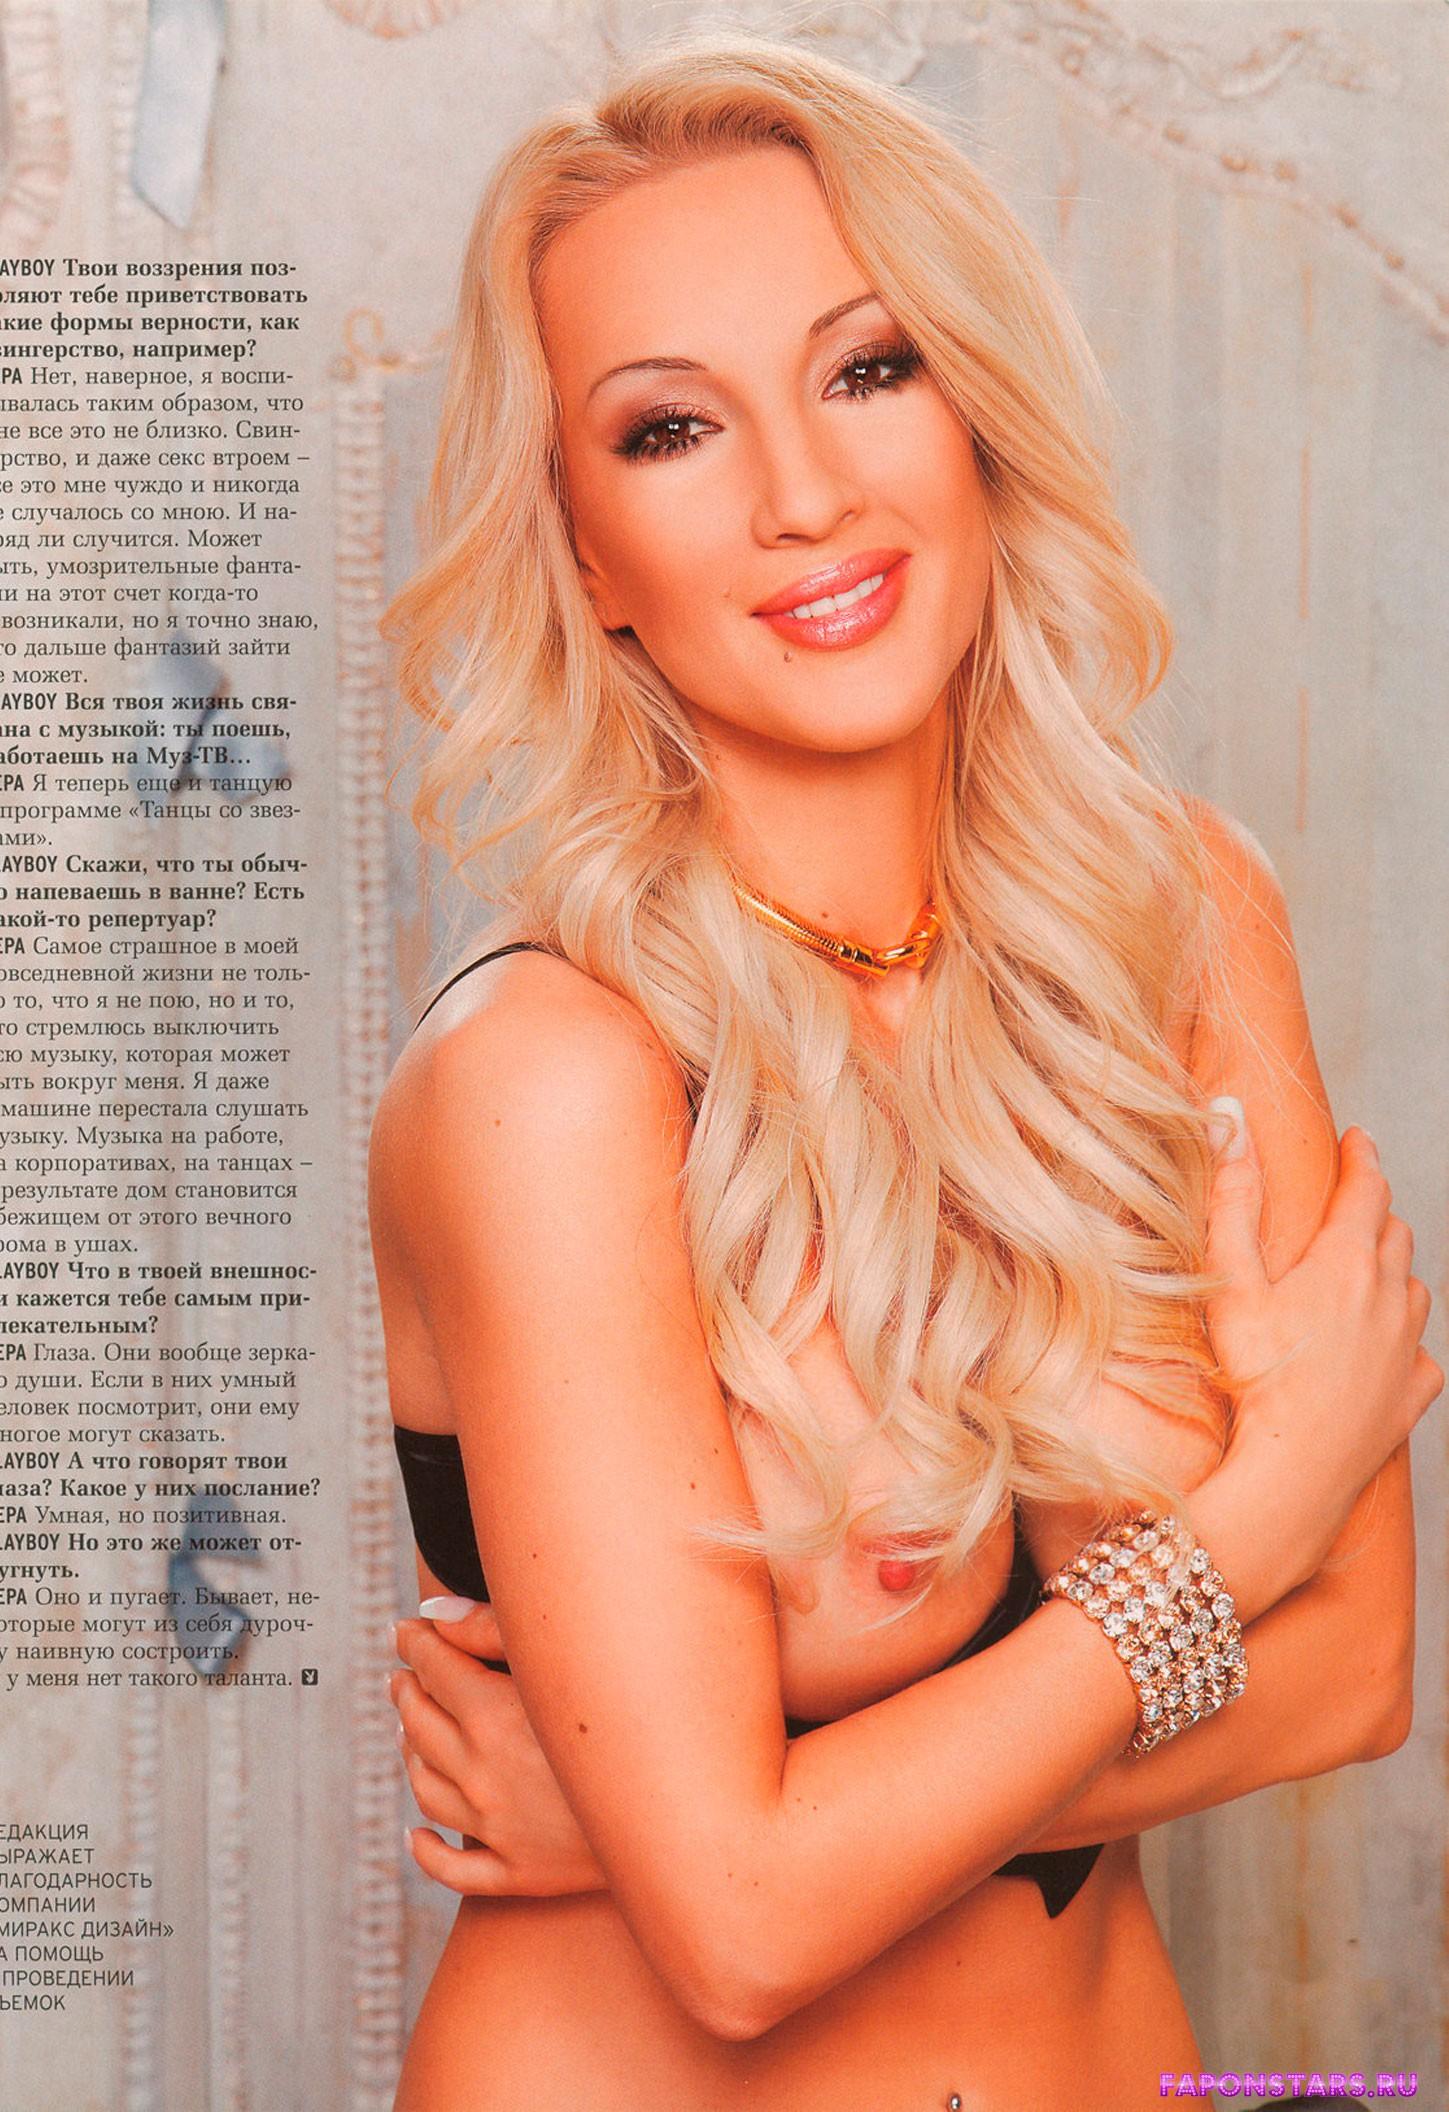 Лера Кудрявцева в журнале